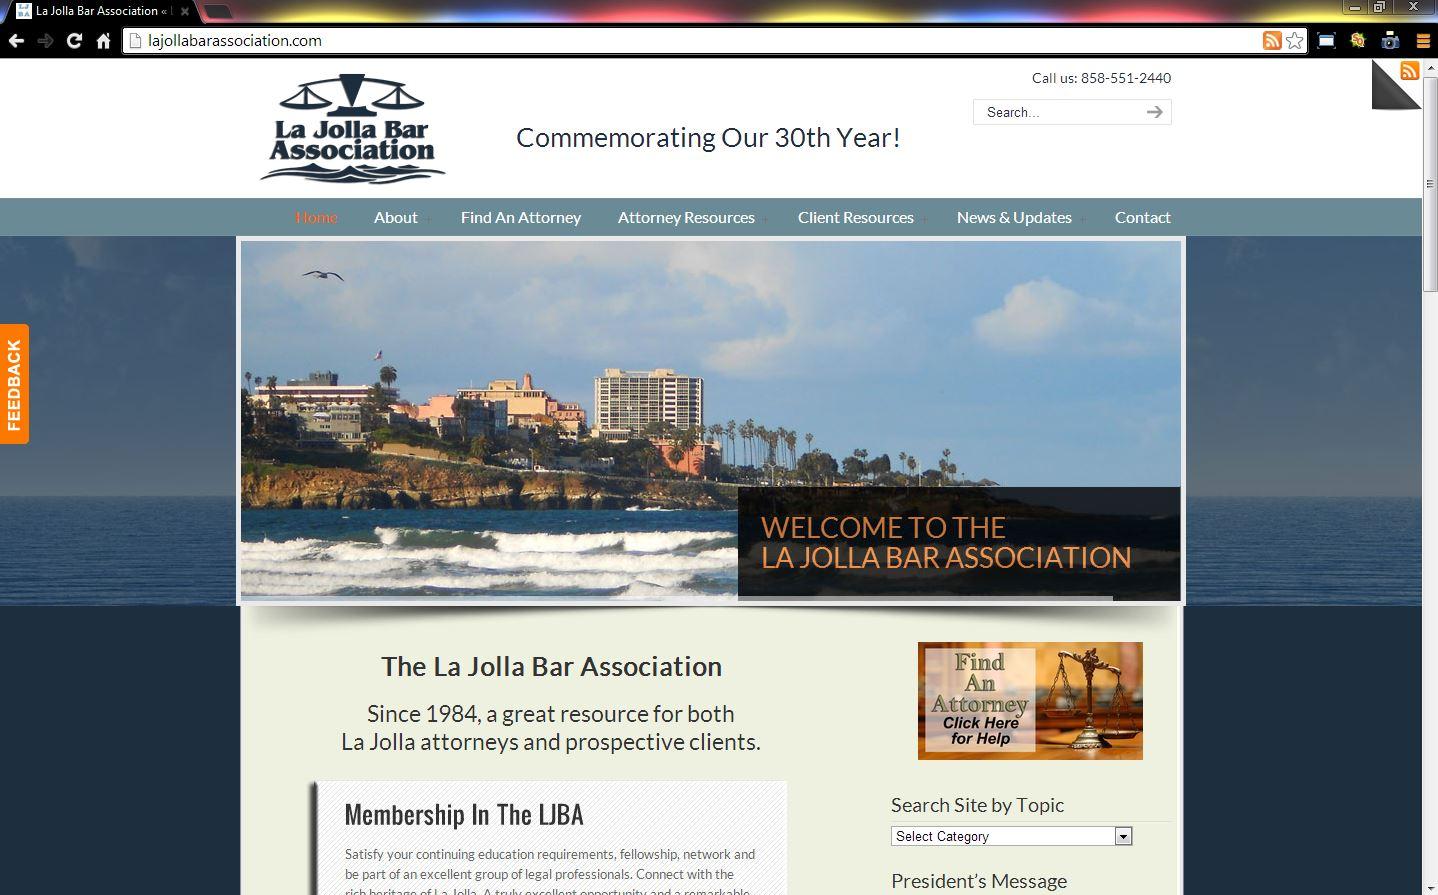 Brass Ring Multimedia presents La Jolla Bar Association (LJBA) WordPress Website